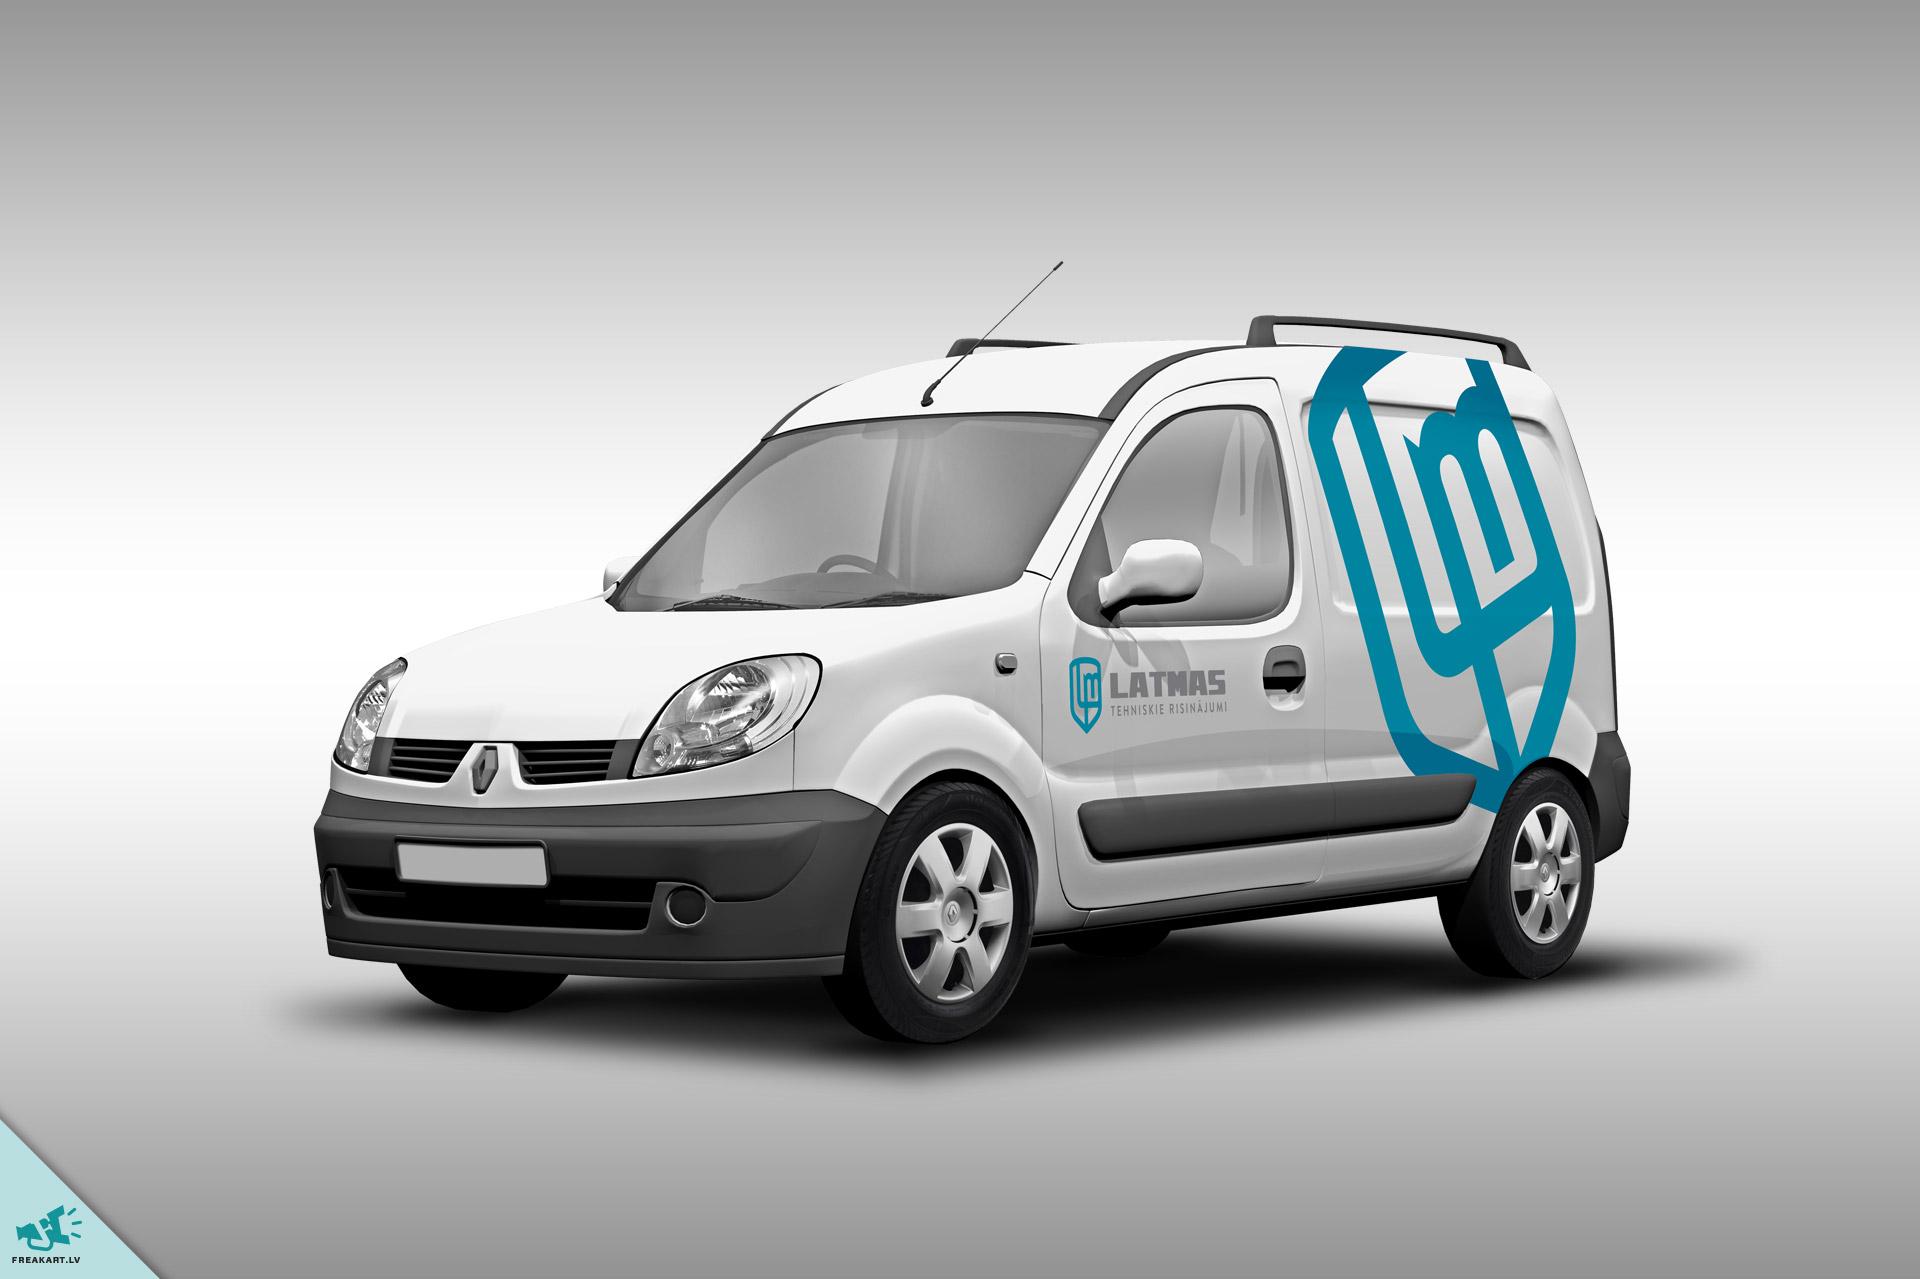 freakart.lv-logo-logotipa-dizains-vizitkartes-dizains-auto-uzlime-firmas-stils-04